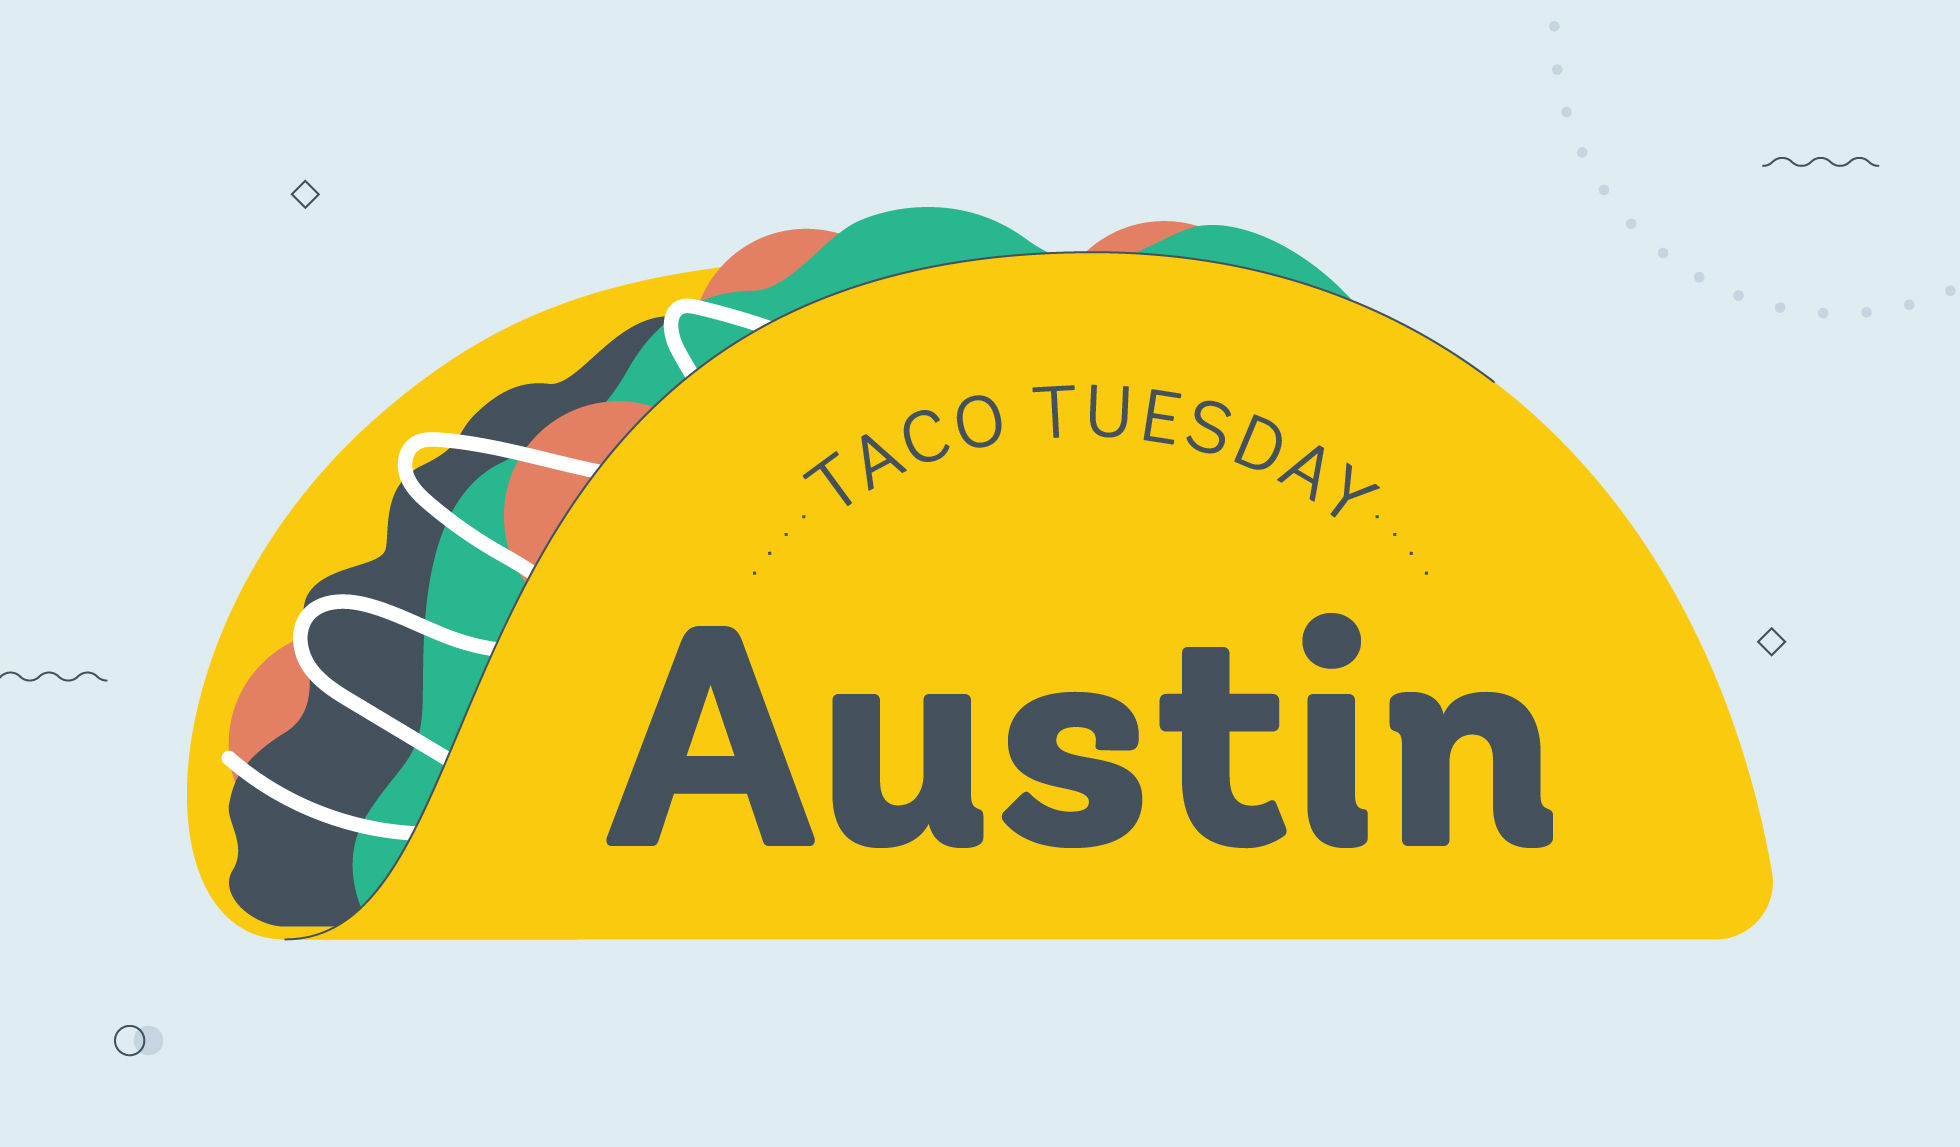 taco tuesday austin graphic